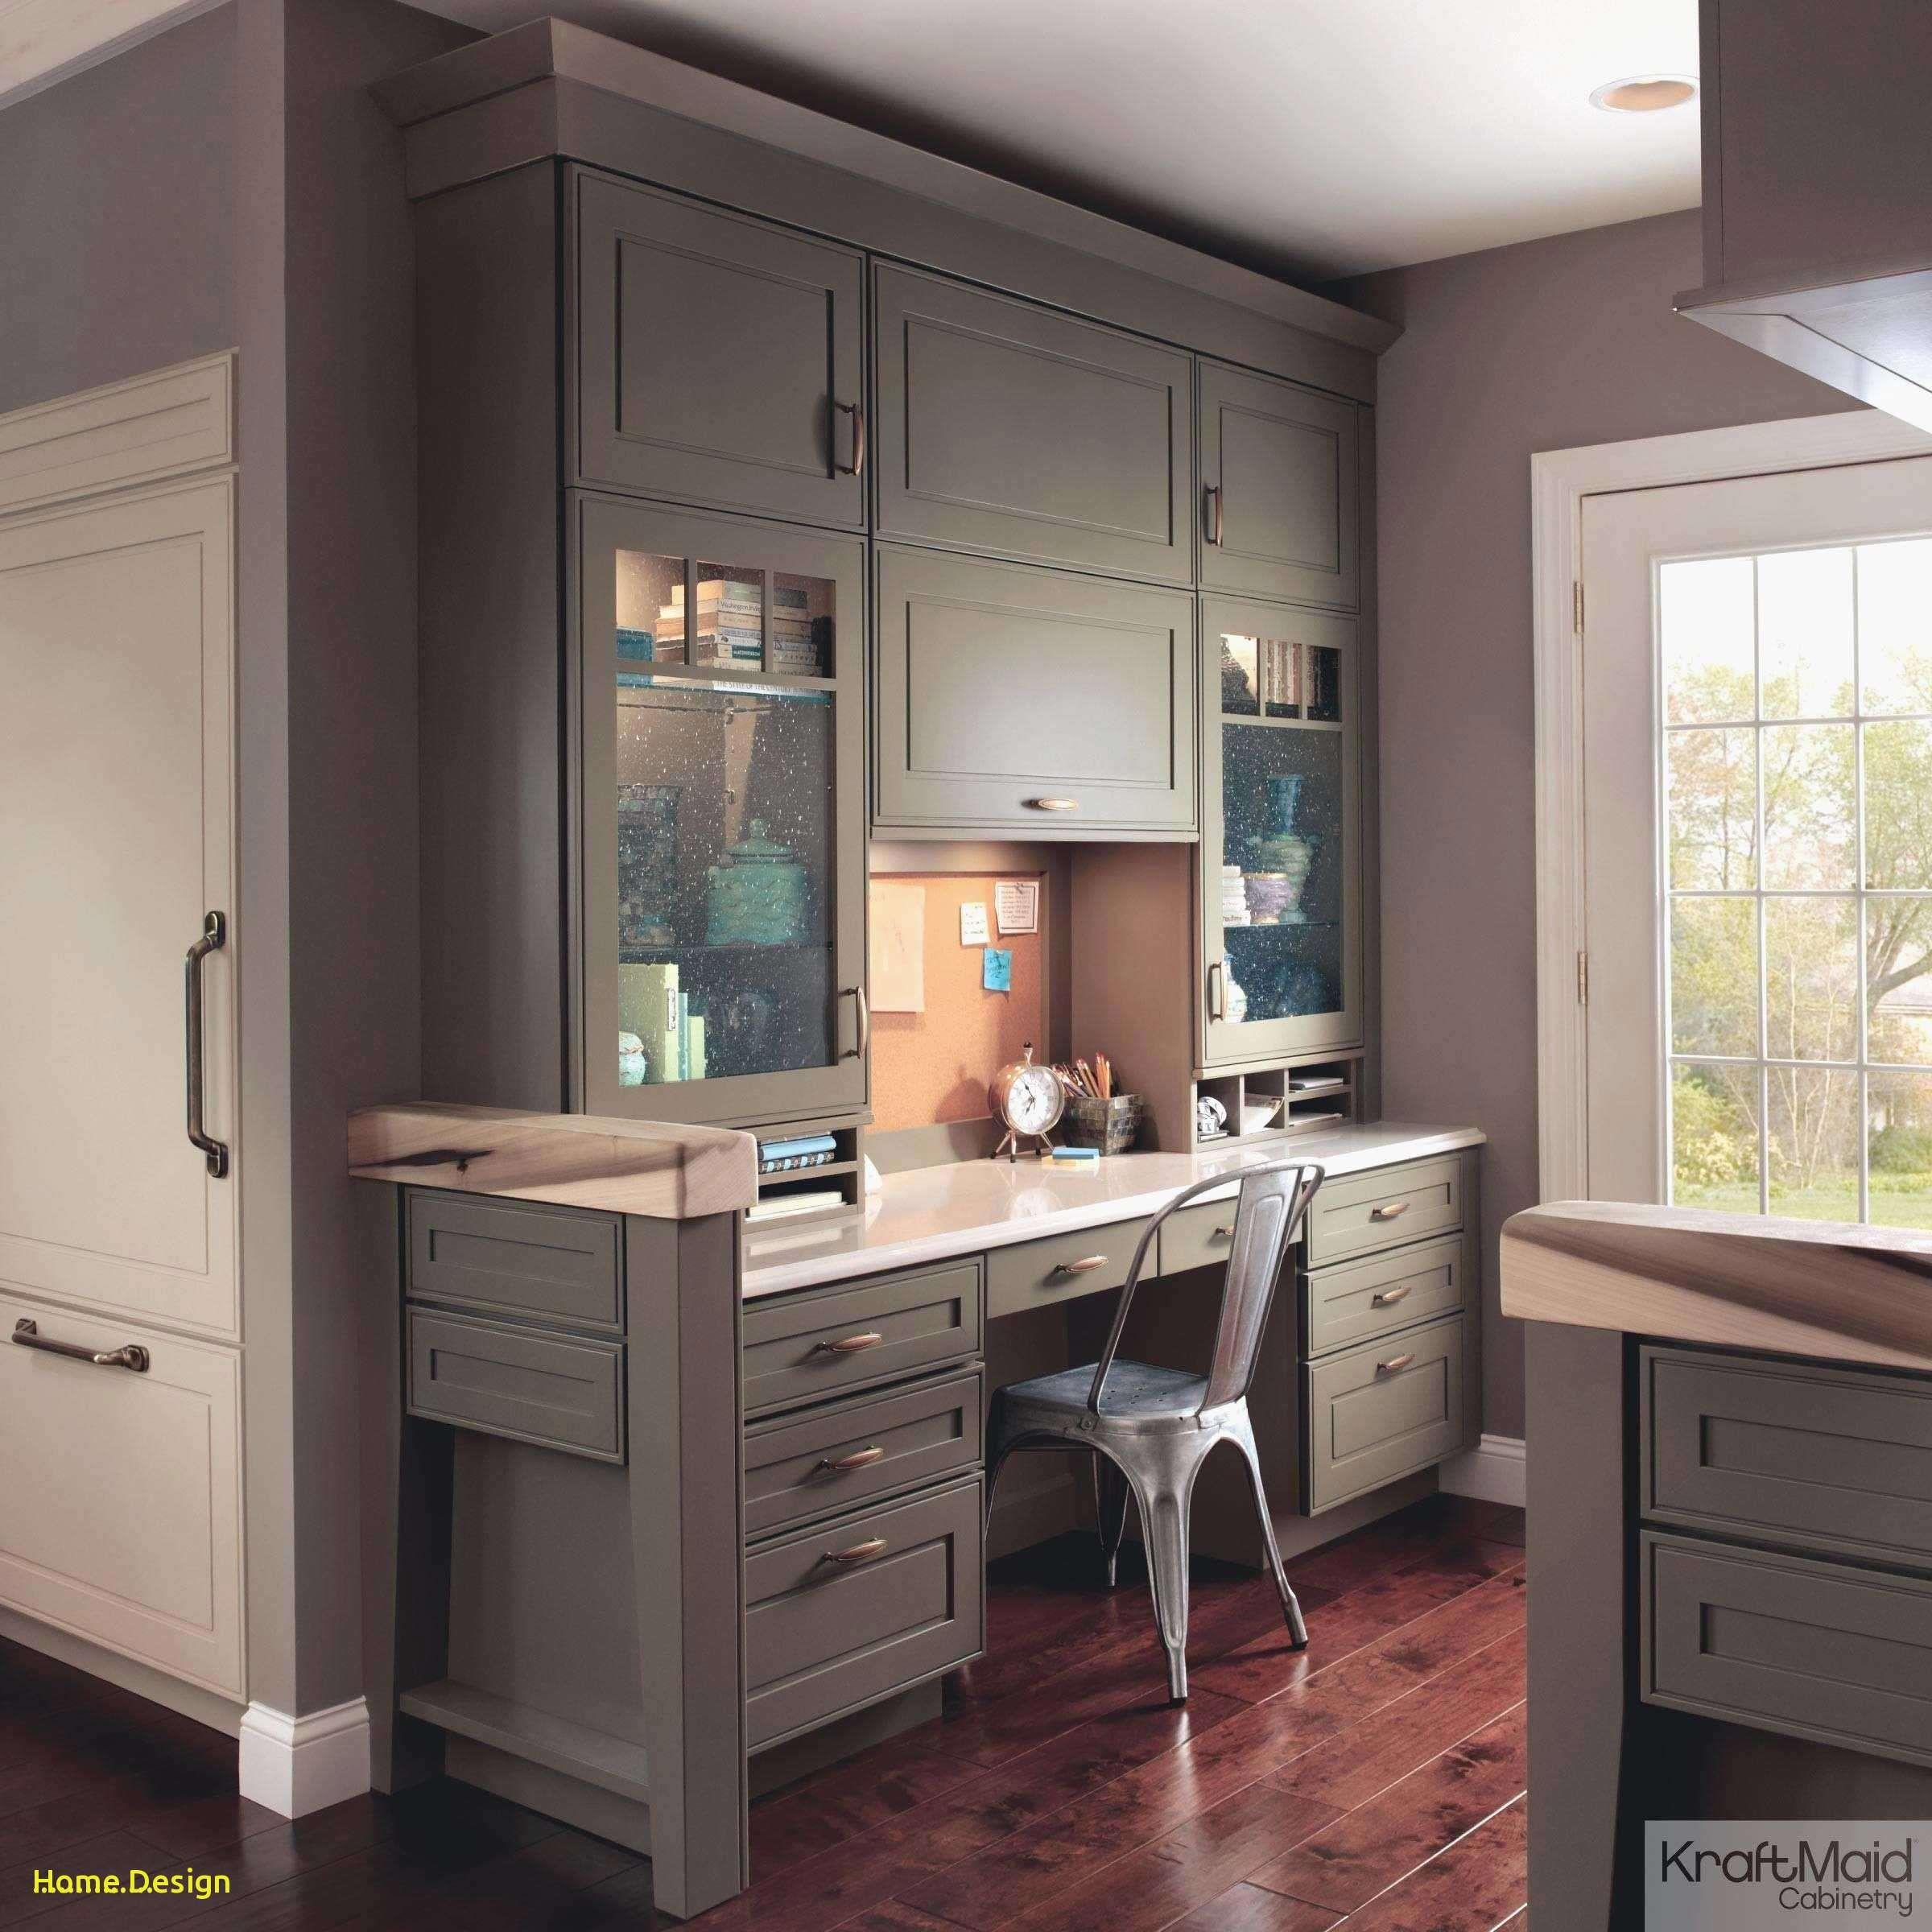 Awesome Navy Kitchens Homedesign Homedecor Homediy Https Klikhomedesign Com Na Beautiful Kitchen Cabinets Glass Kitchen Cabinets Kitchen Cabinet Design